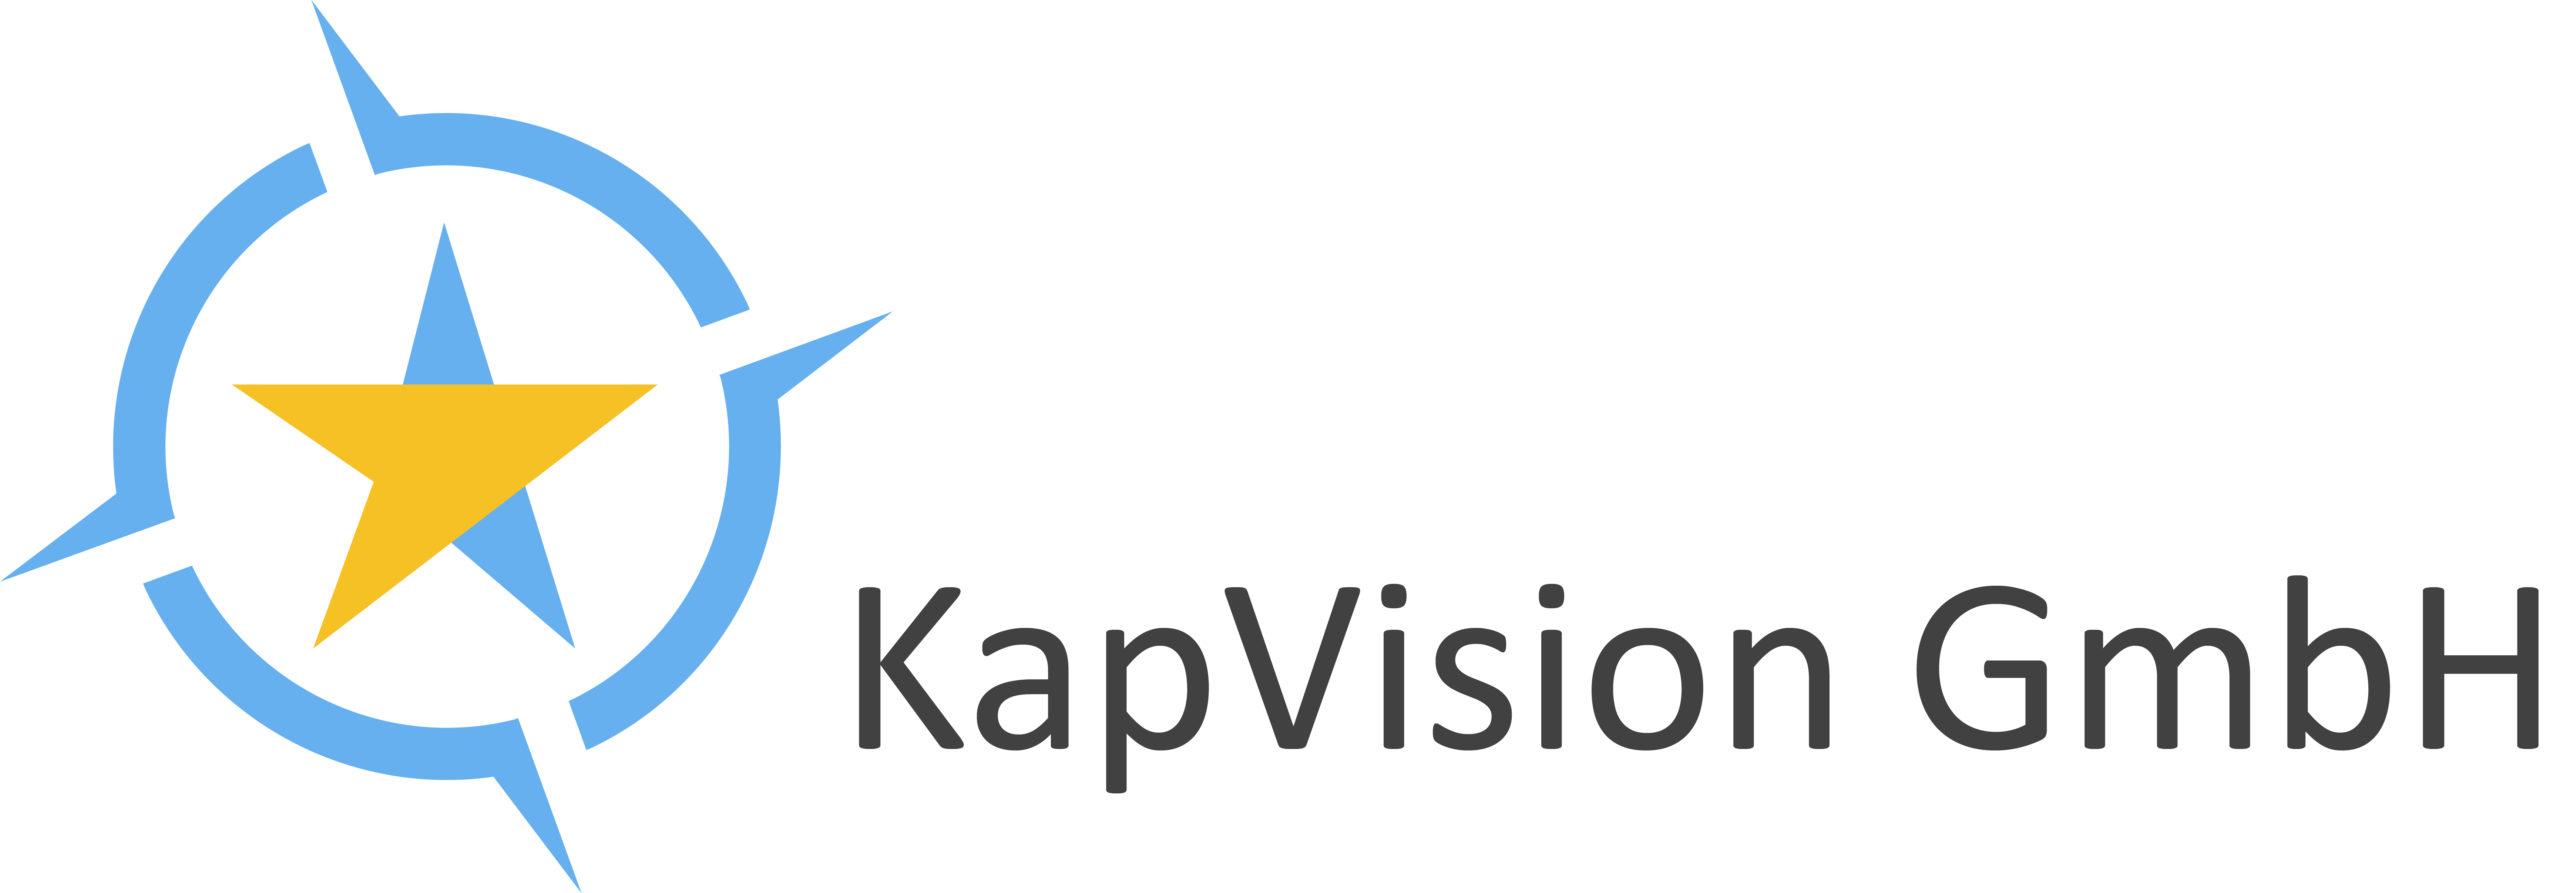 Kapvision GmbH